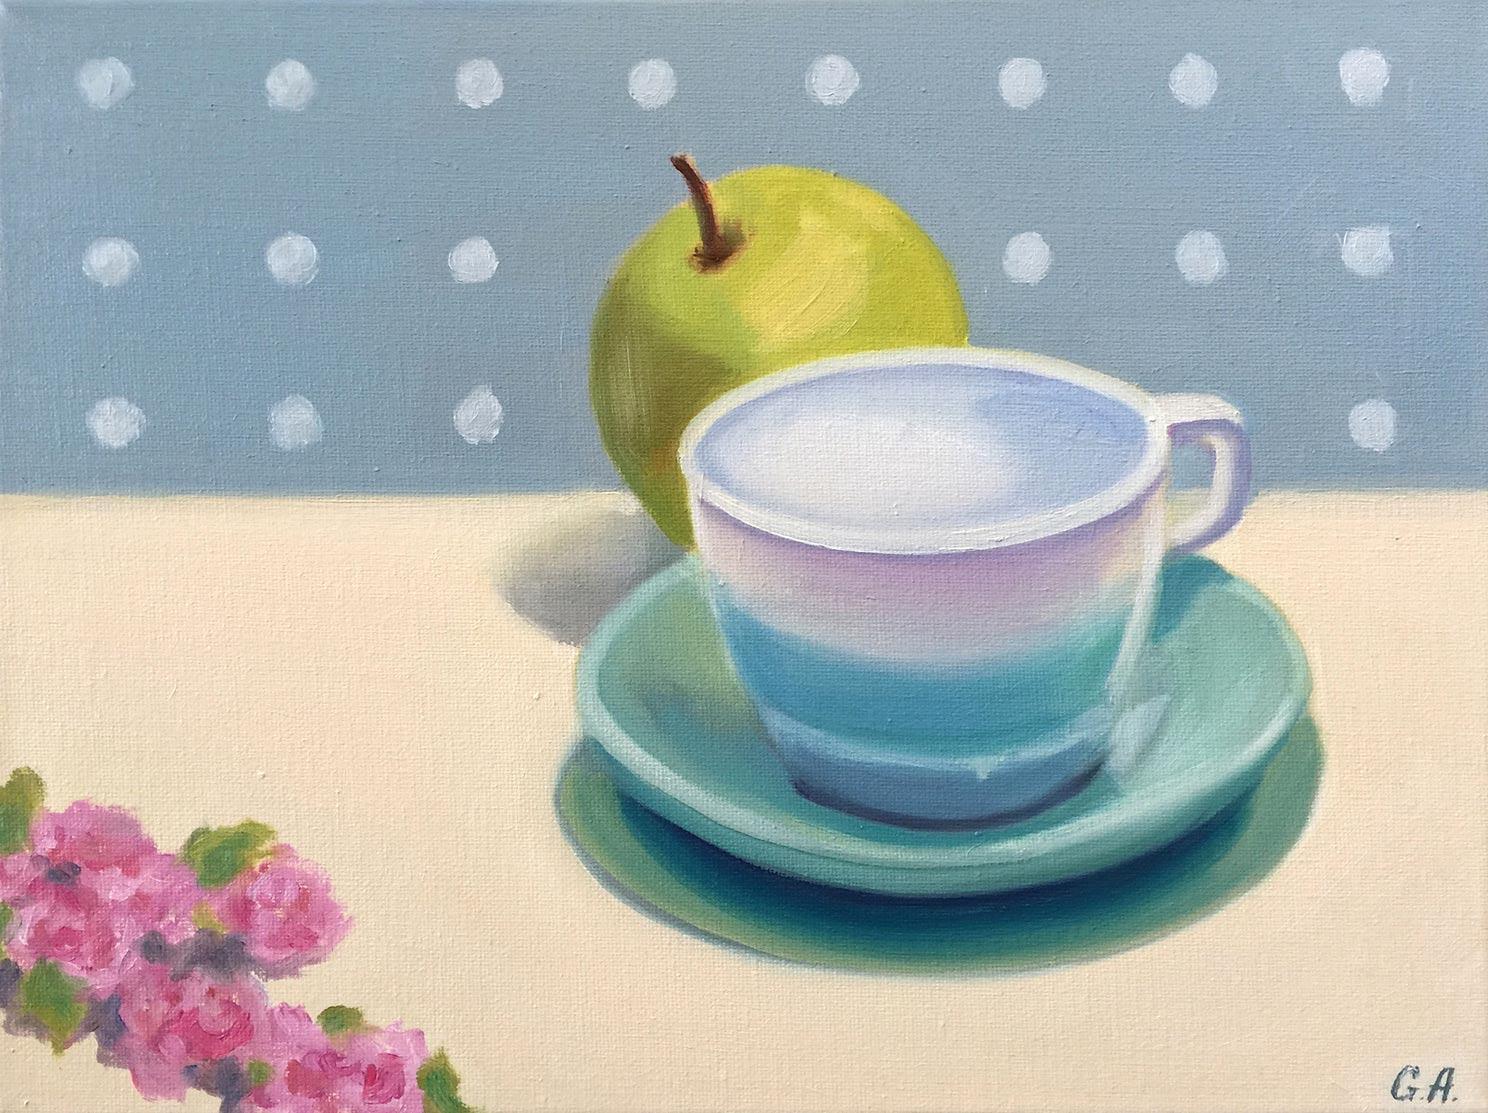 Still-life-Cup-Apple-Flowers-Giselle-Ayupova-painting.jpg